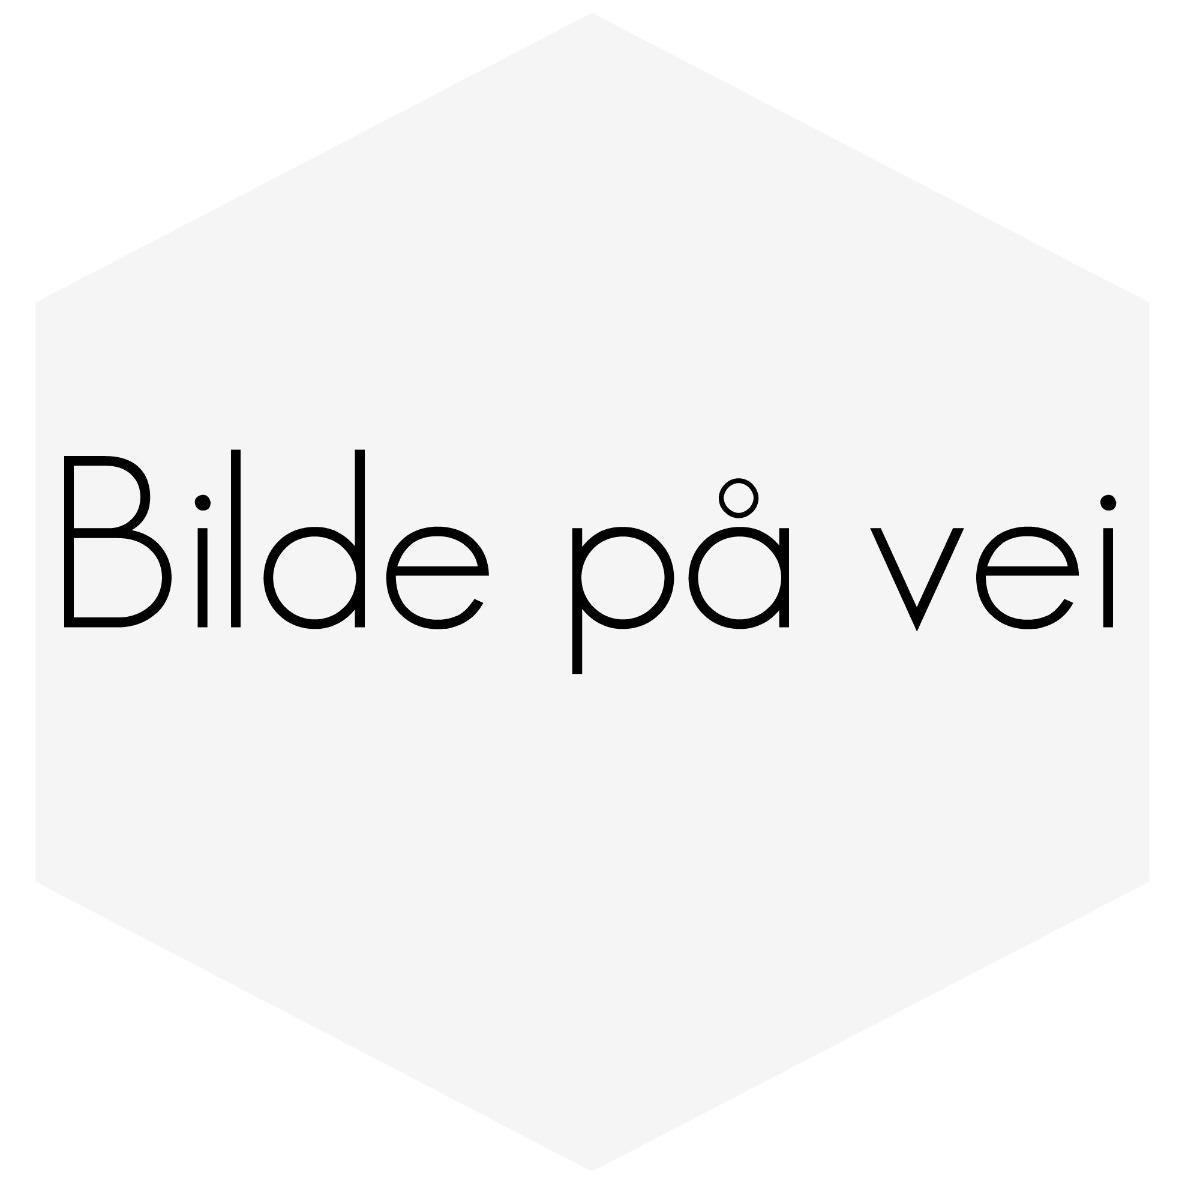 Frontspoiler Volvo 140 i olackerat glasfiber